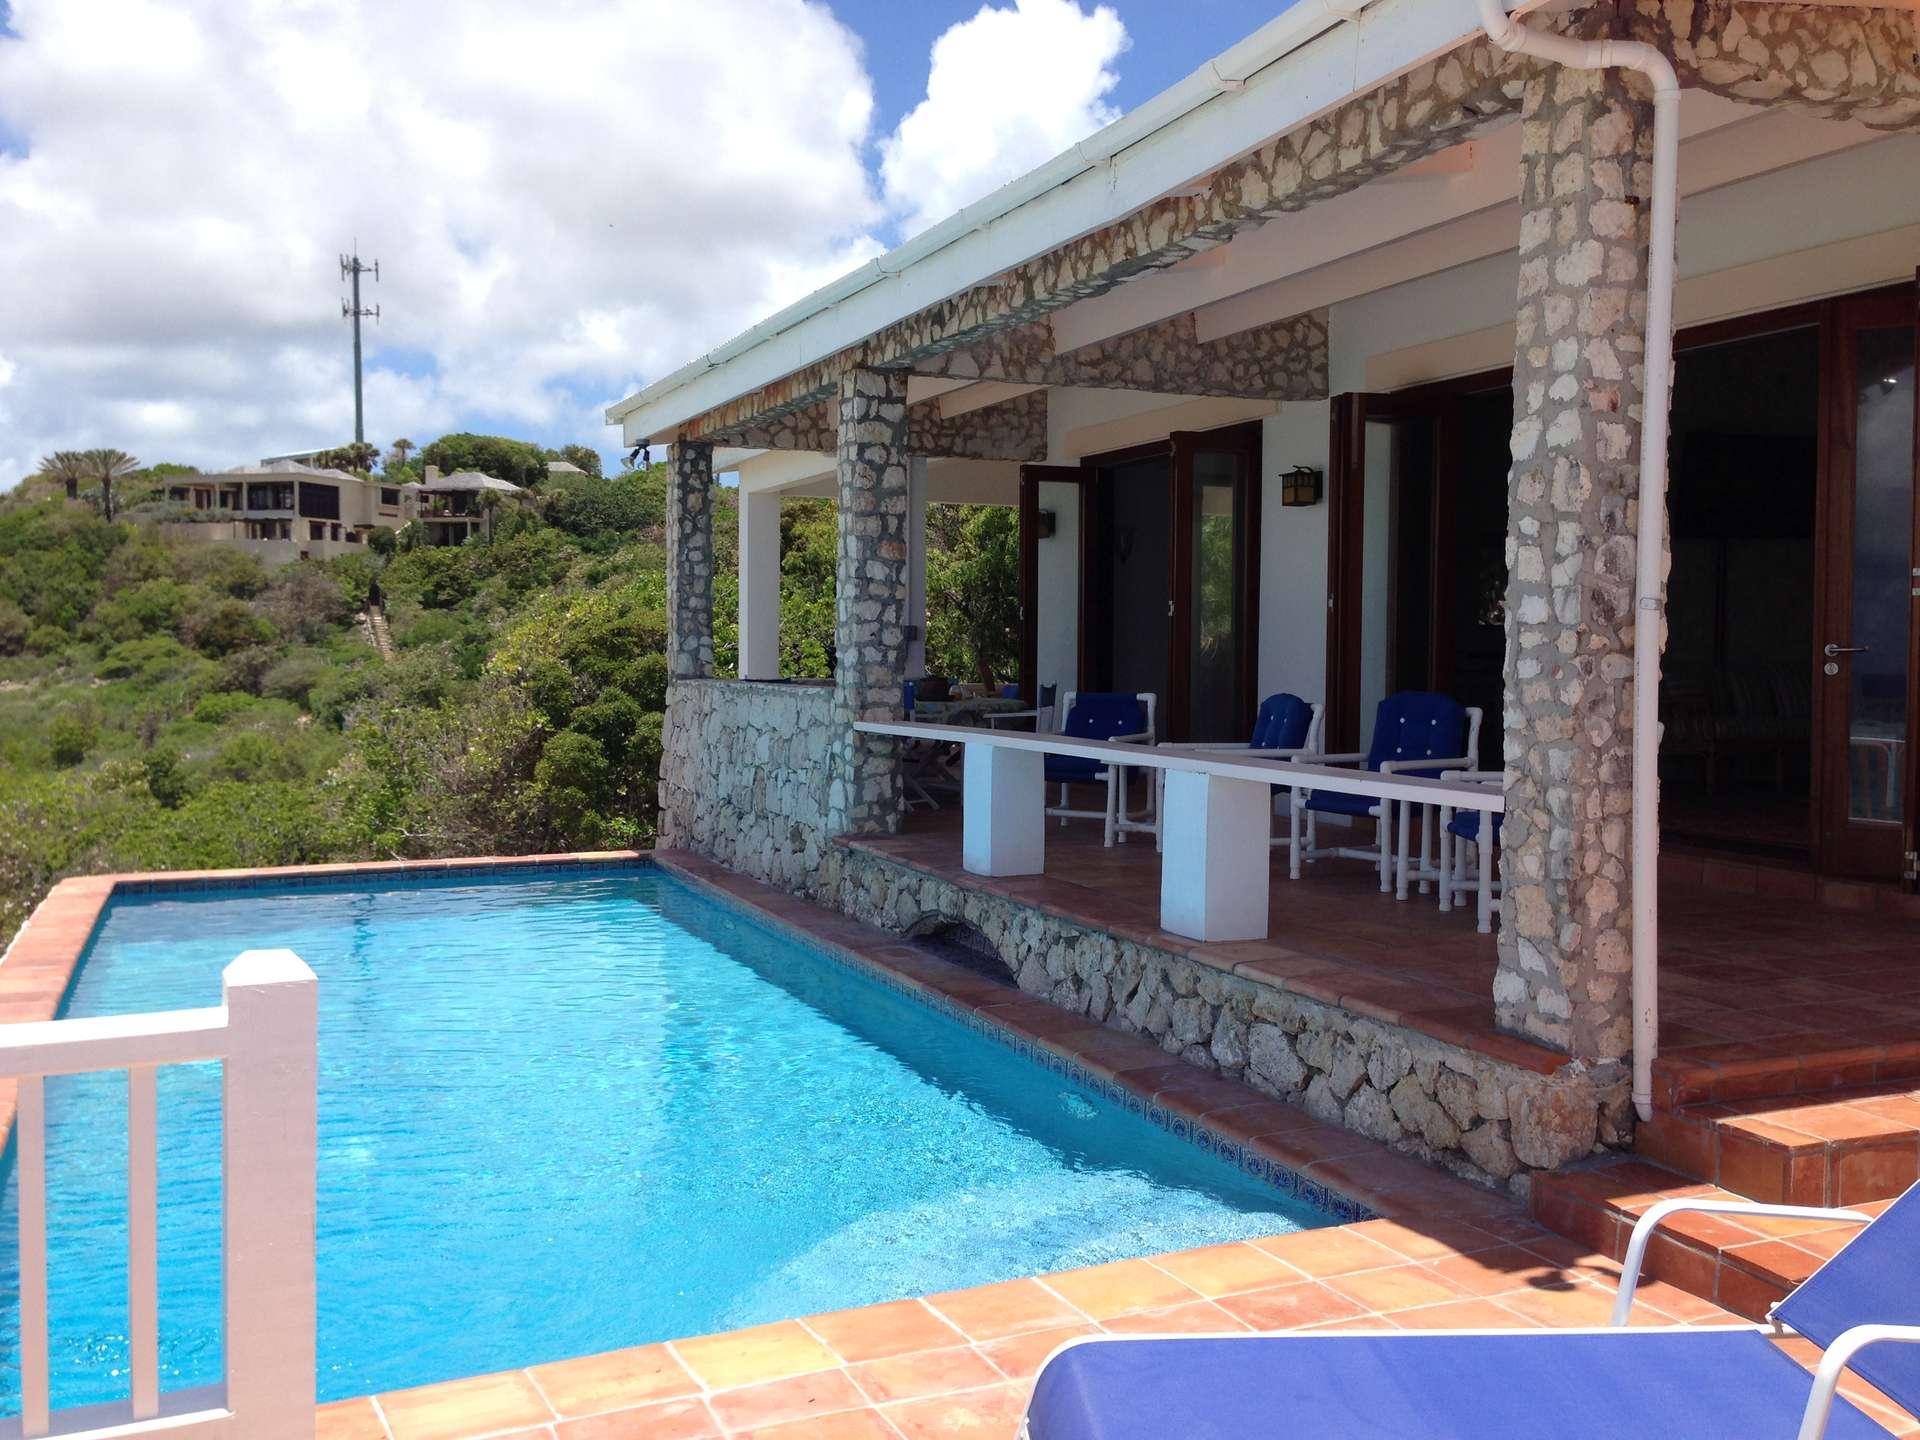 Luxury villa rentals caribbean - Anguilla - Sandy hill - No location 4 - Dolphins Villa - Image 1/23